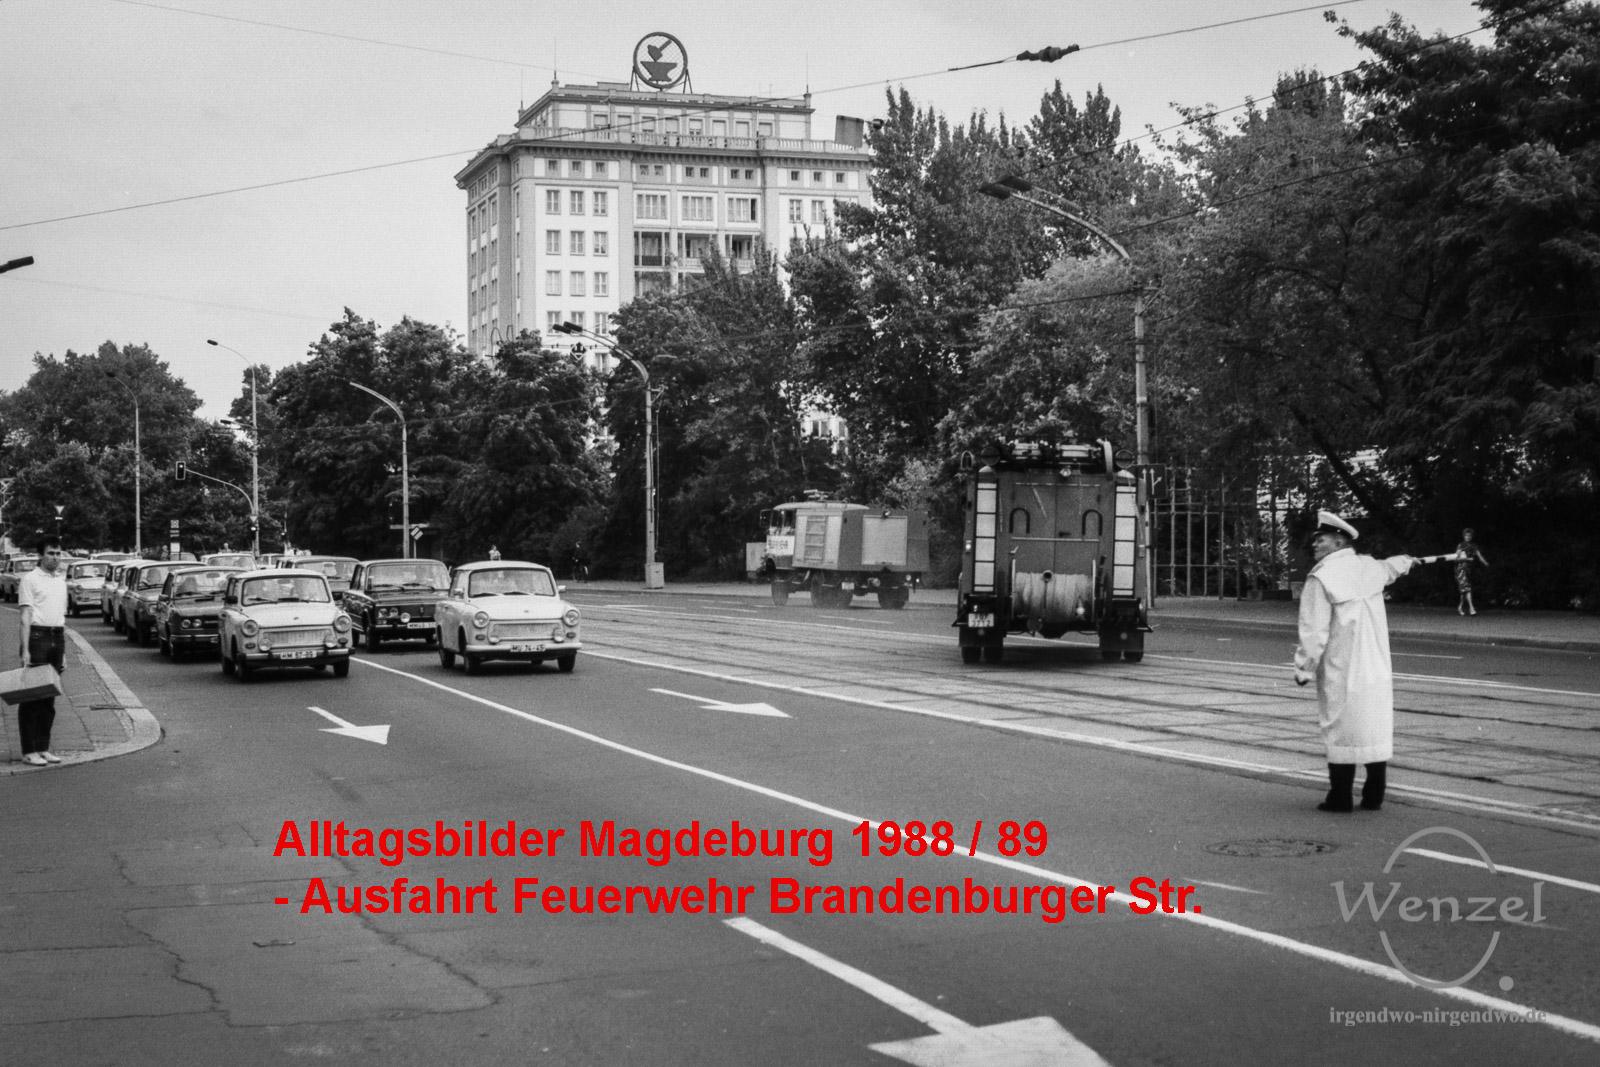 Stadtverkehr - Magdeburg 1989/90